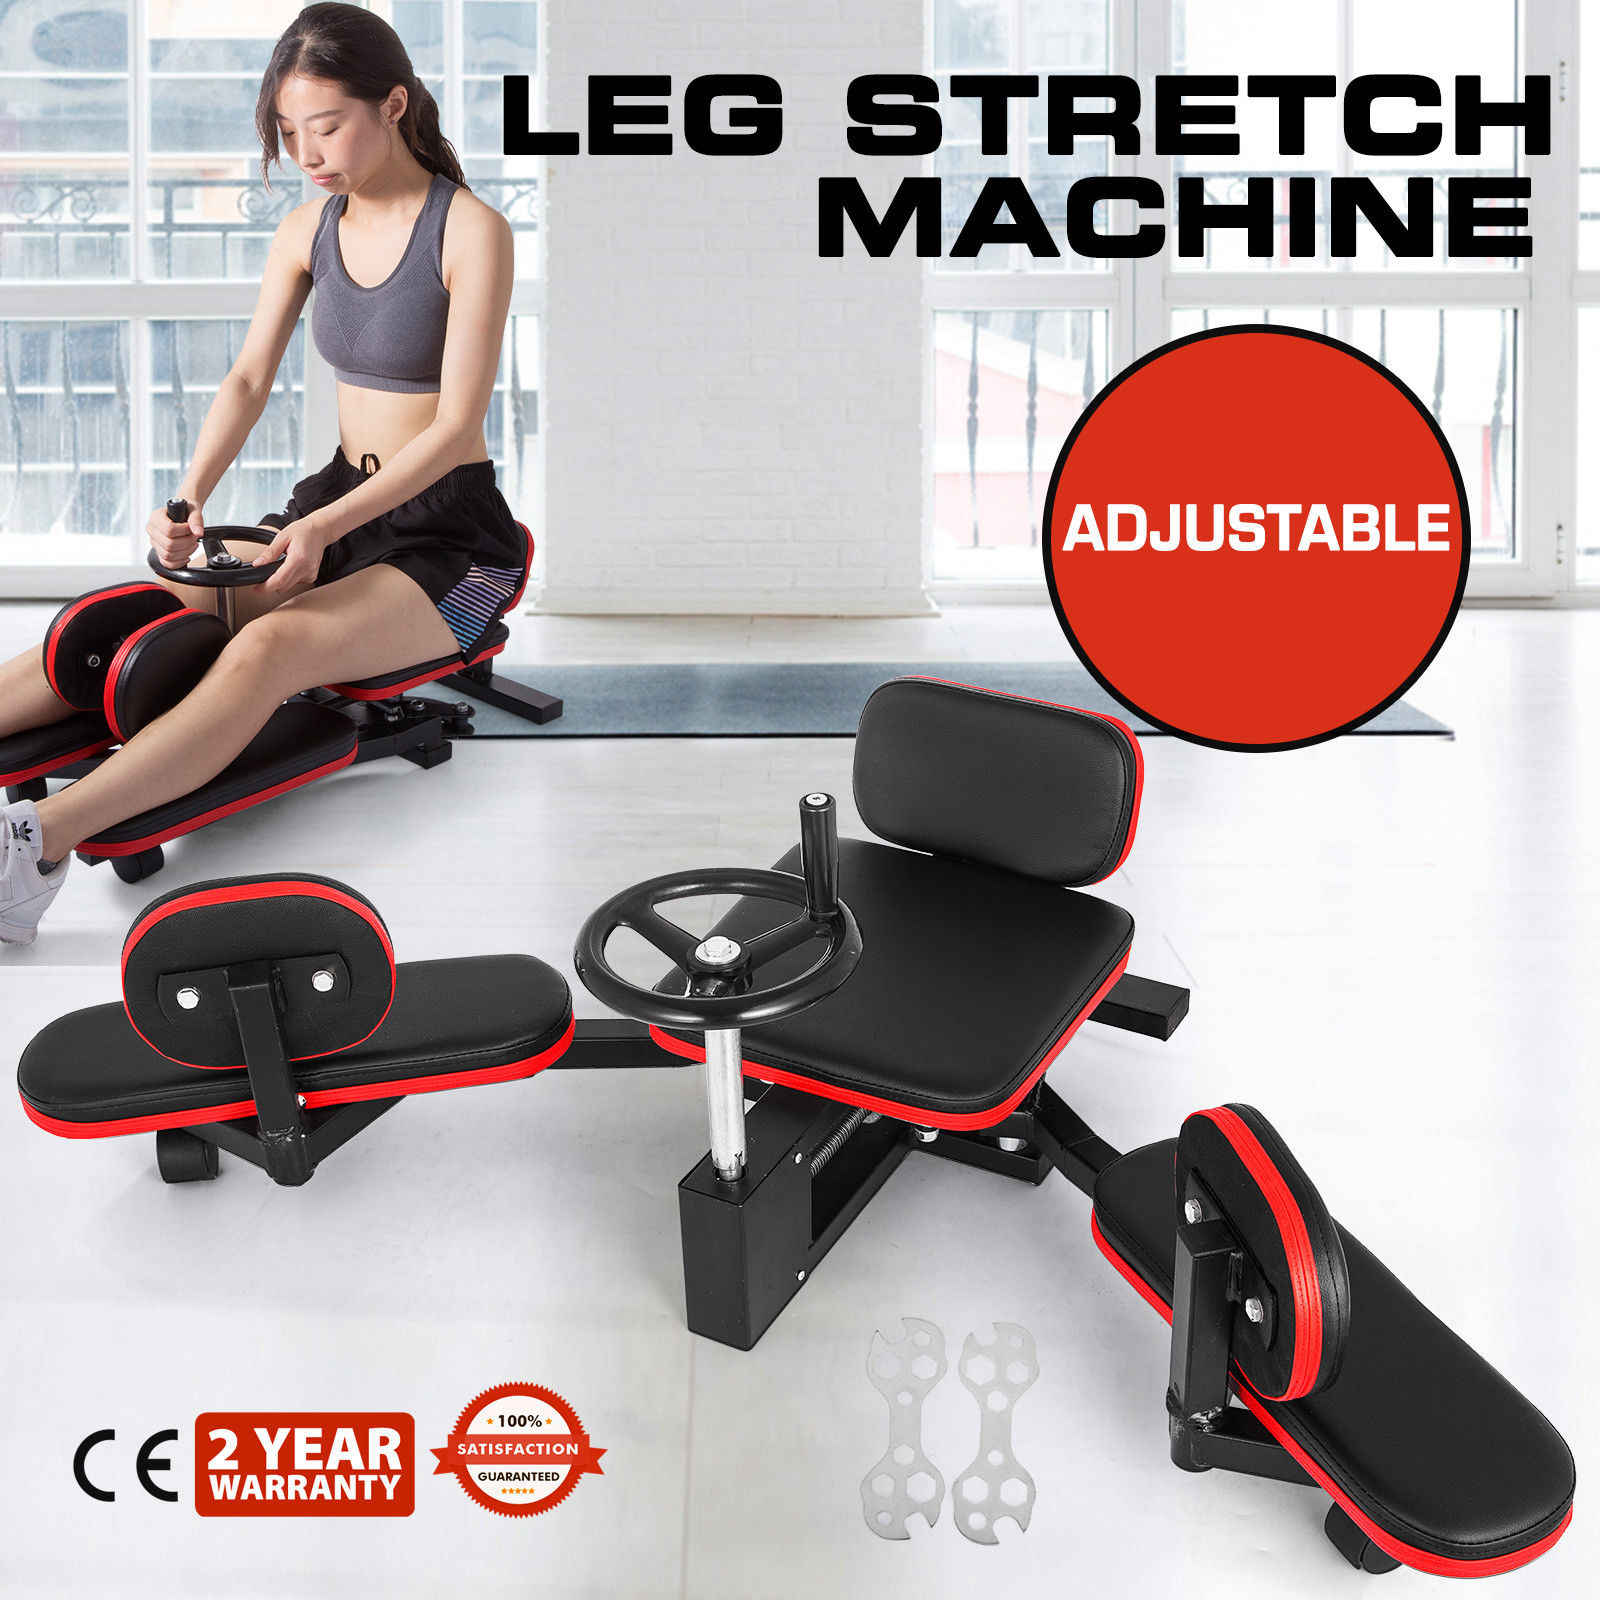 Split Trainer Helper Leg Split Stretching Machine Helper Improve Leg Splits Training Comfort Leg Machine Helper Speed Up The Leg Splits Training GLWAD Leg Stretcher Helper Leg Open Helper